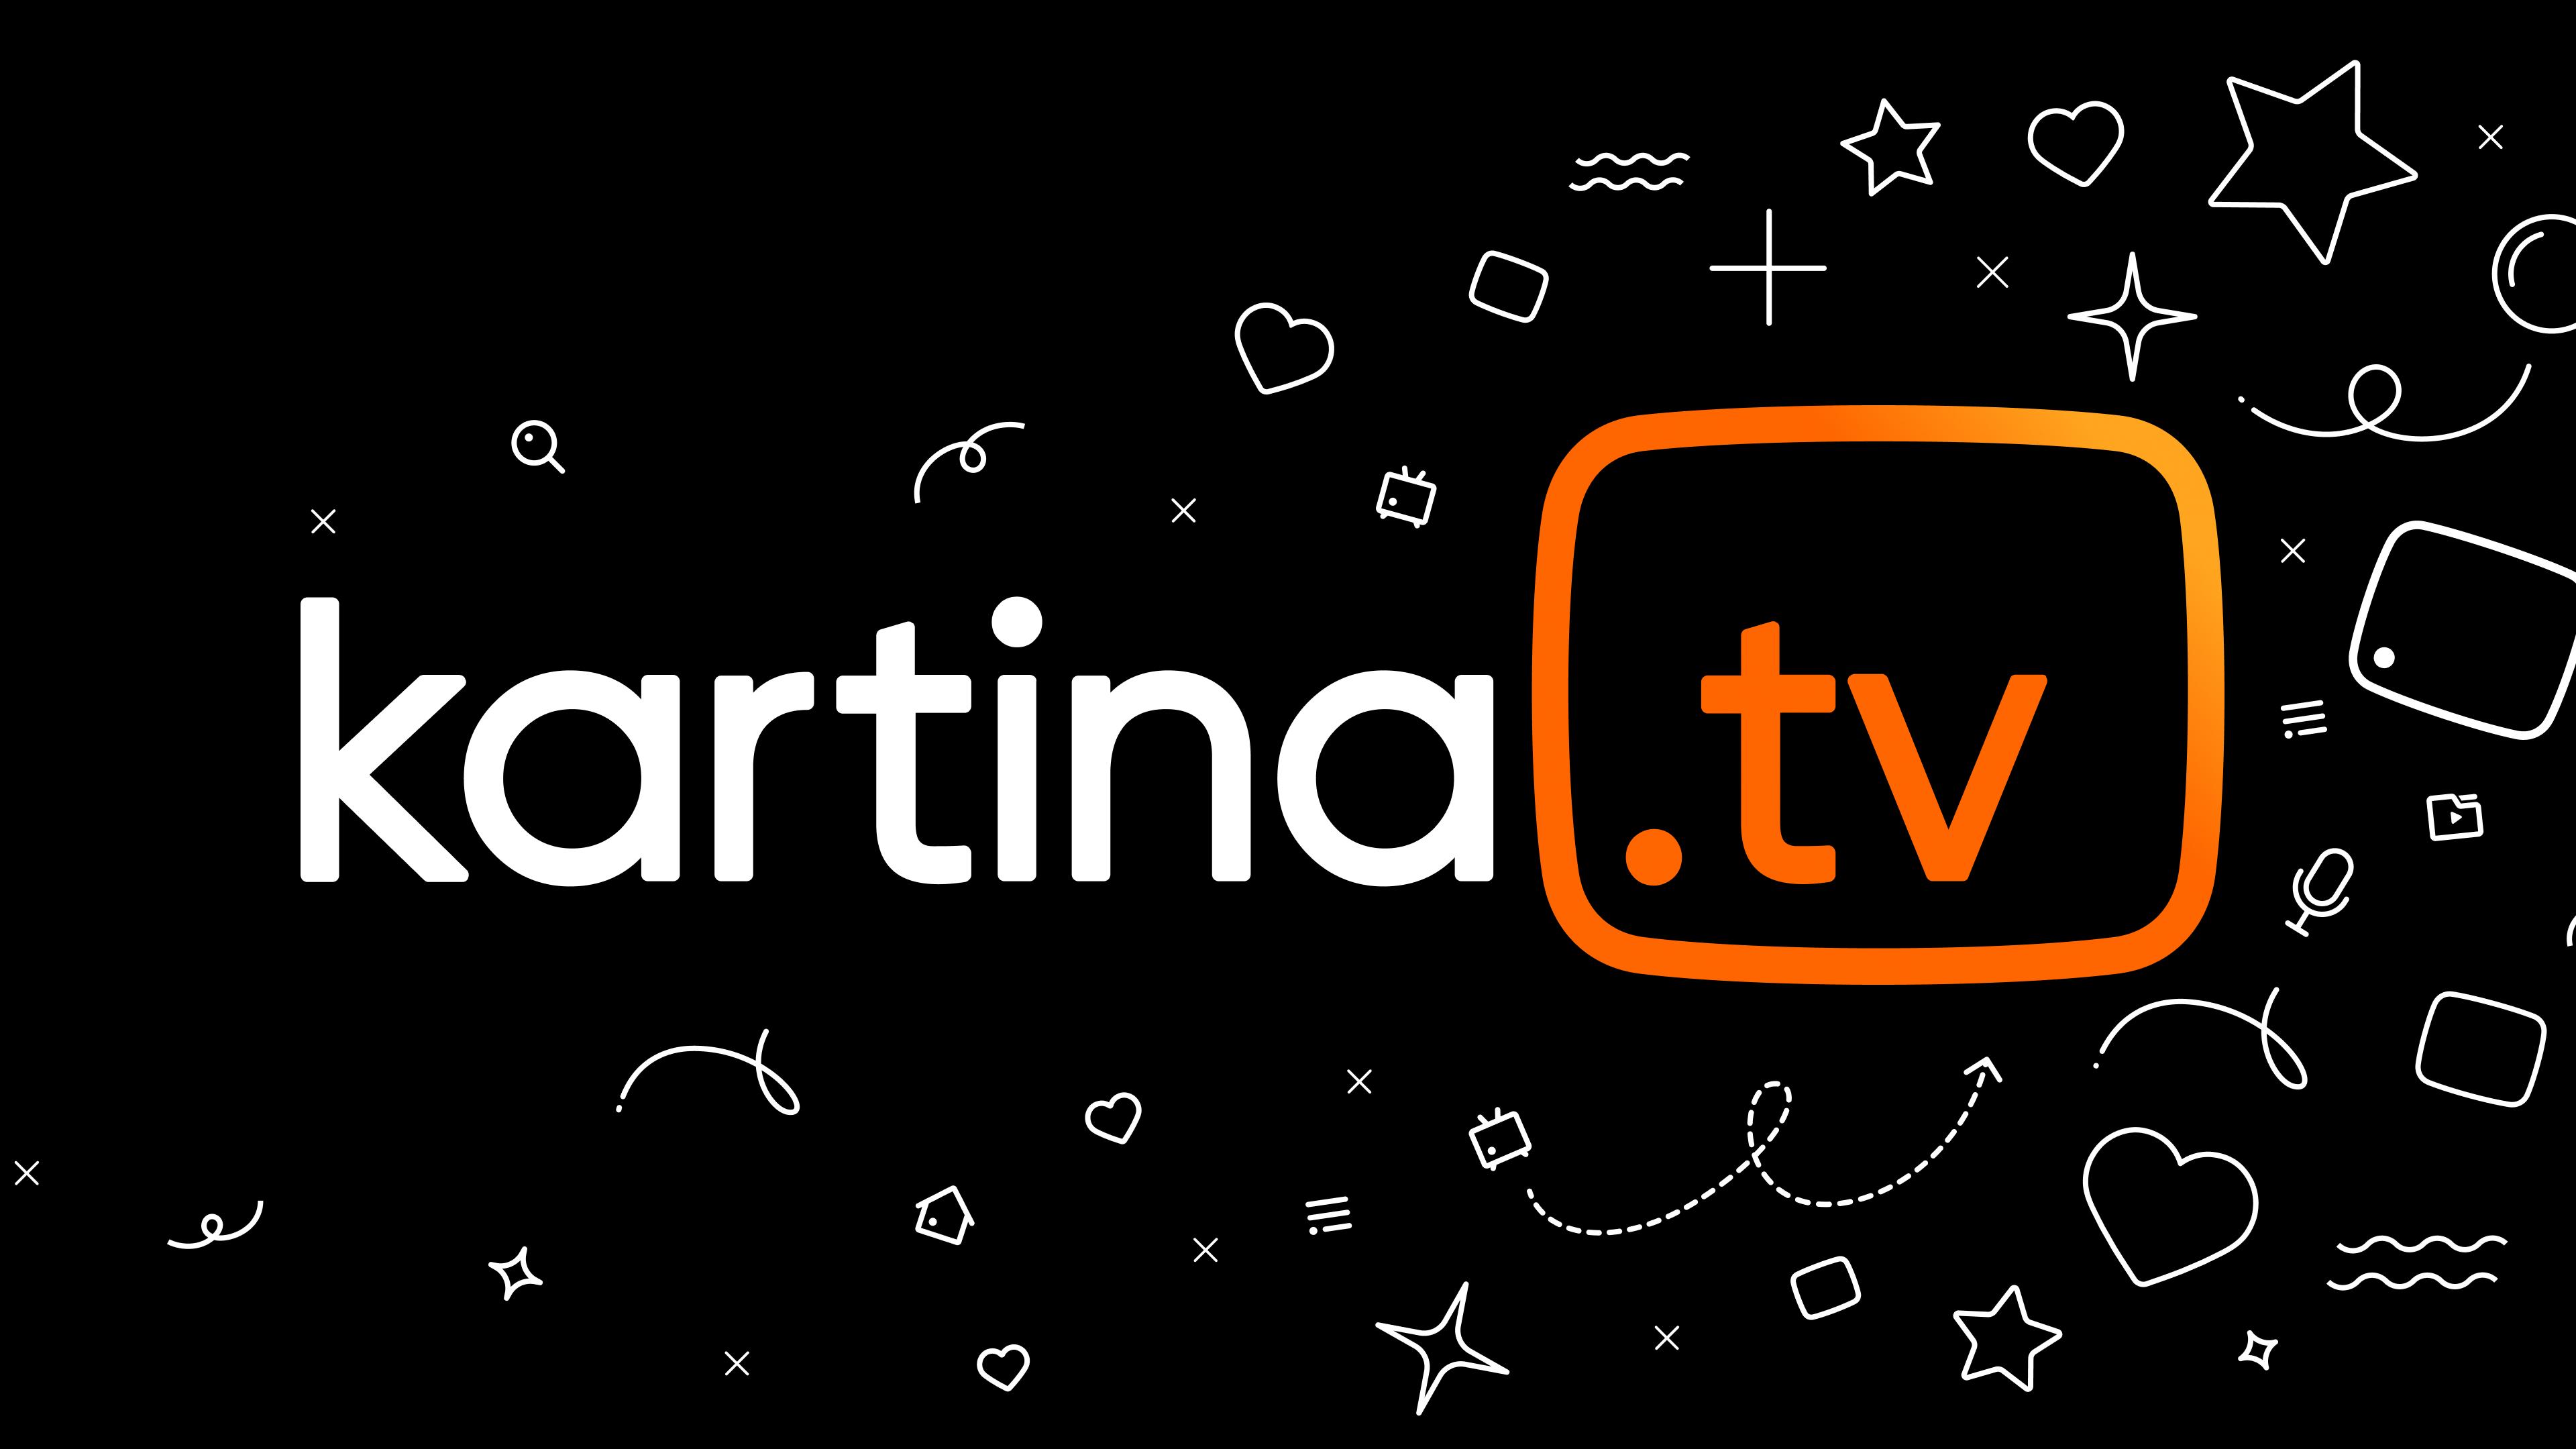 Kartina.TV ребрендинг 2020 год